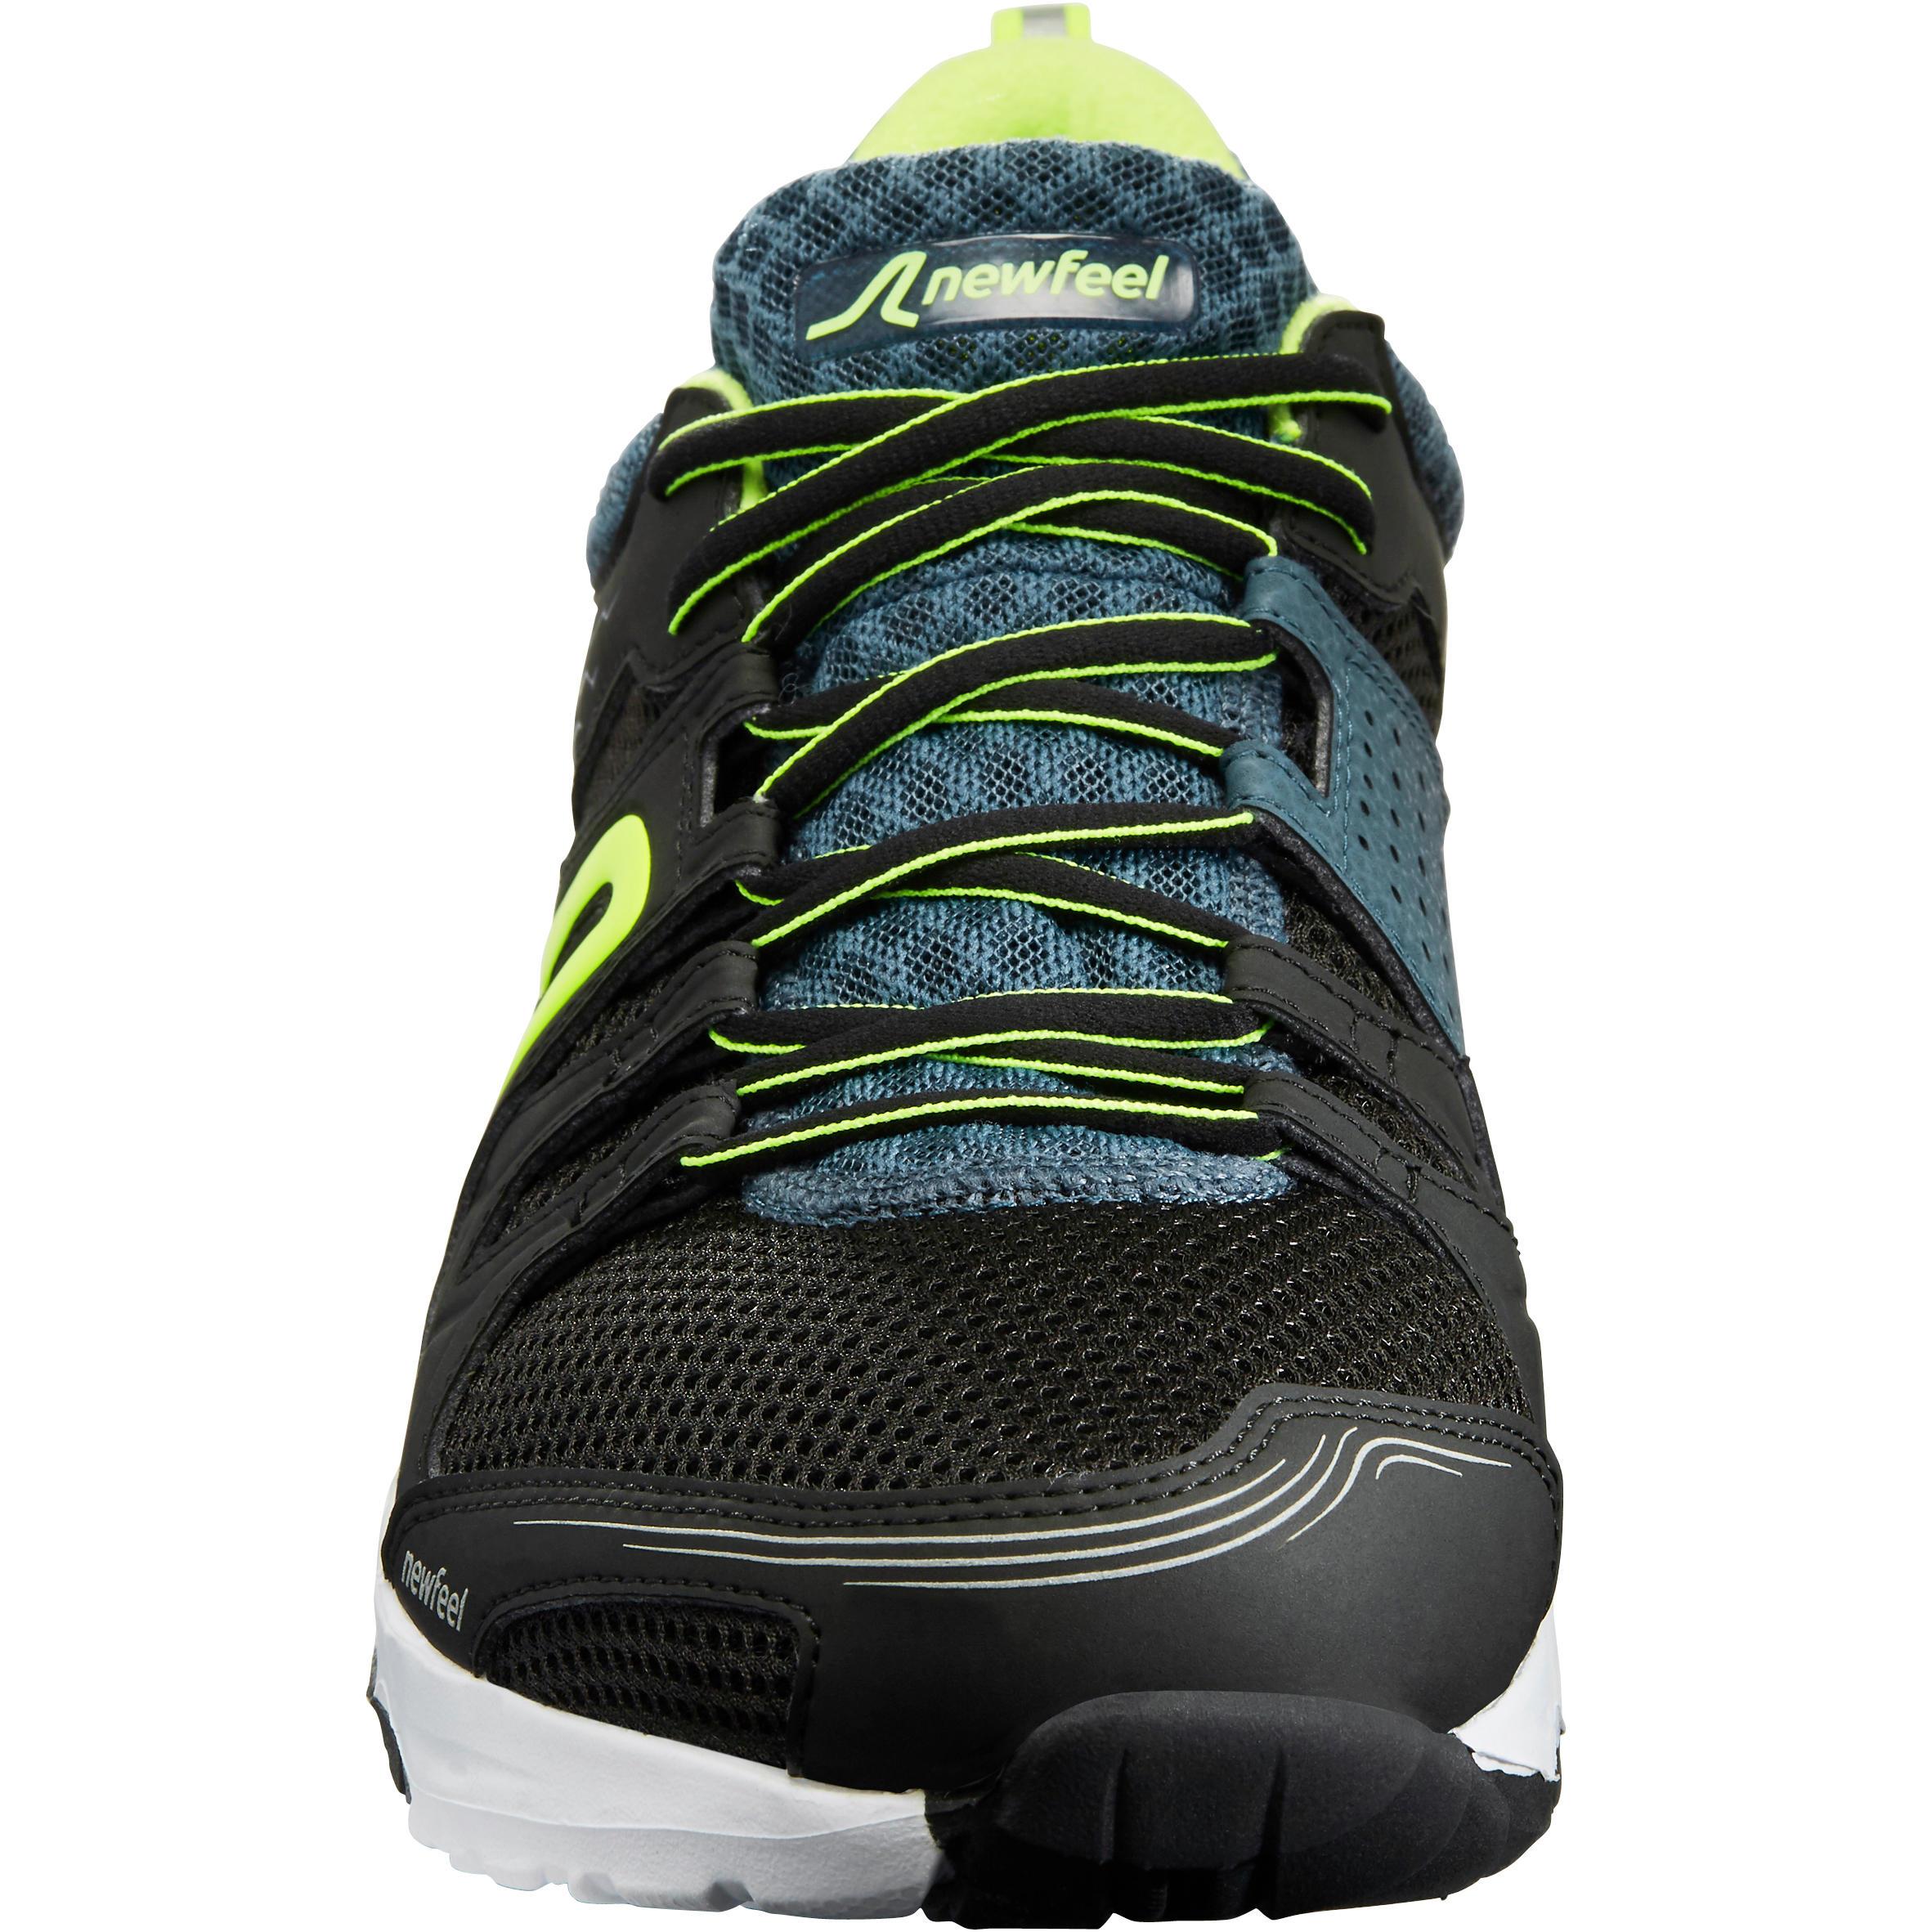 Walking shoes for men PW 240 - Black/Green